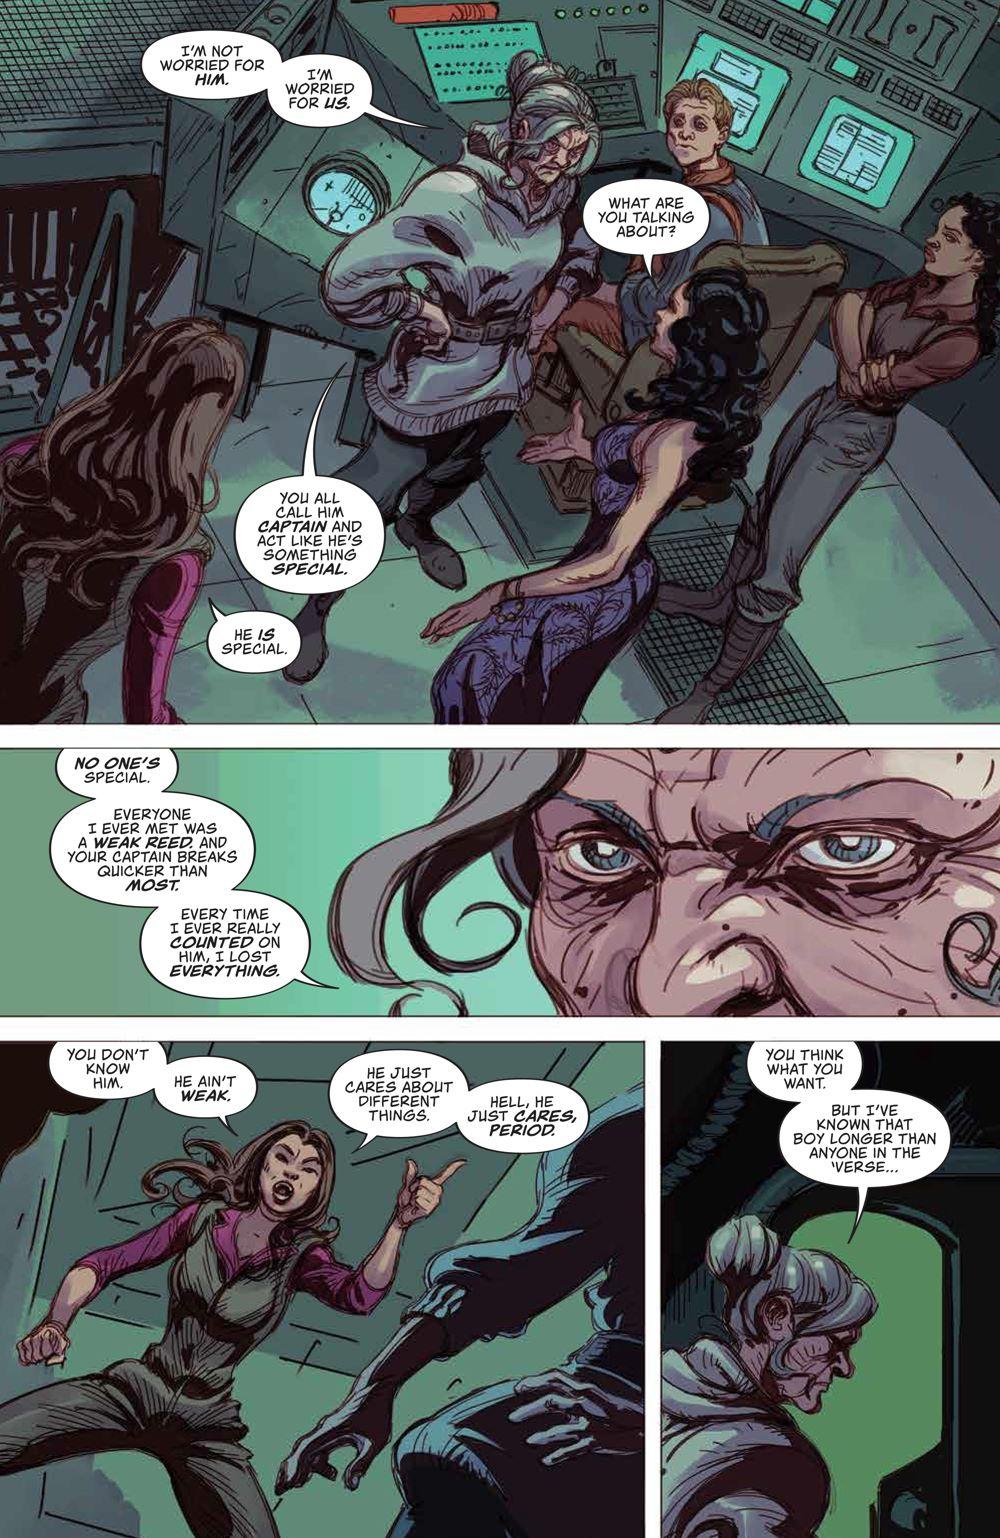 Firefly_BlueSunRising_v2_HC_19 ComicList Previews: FIREFLY BLUE SUN RISING VOLUME 2 HC